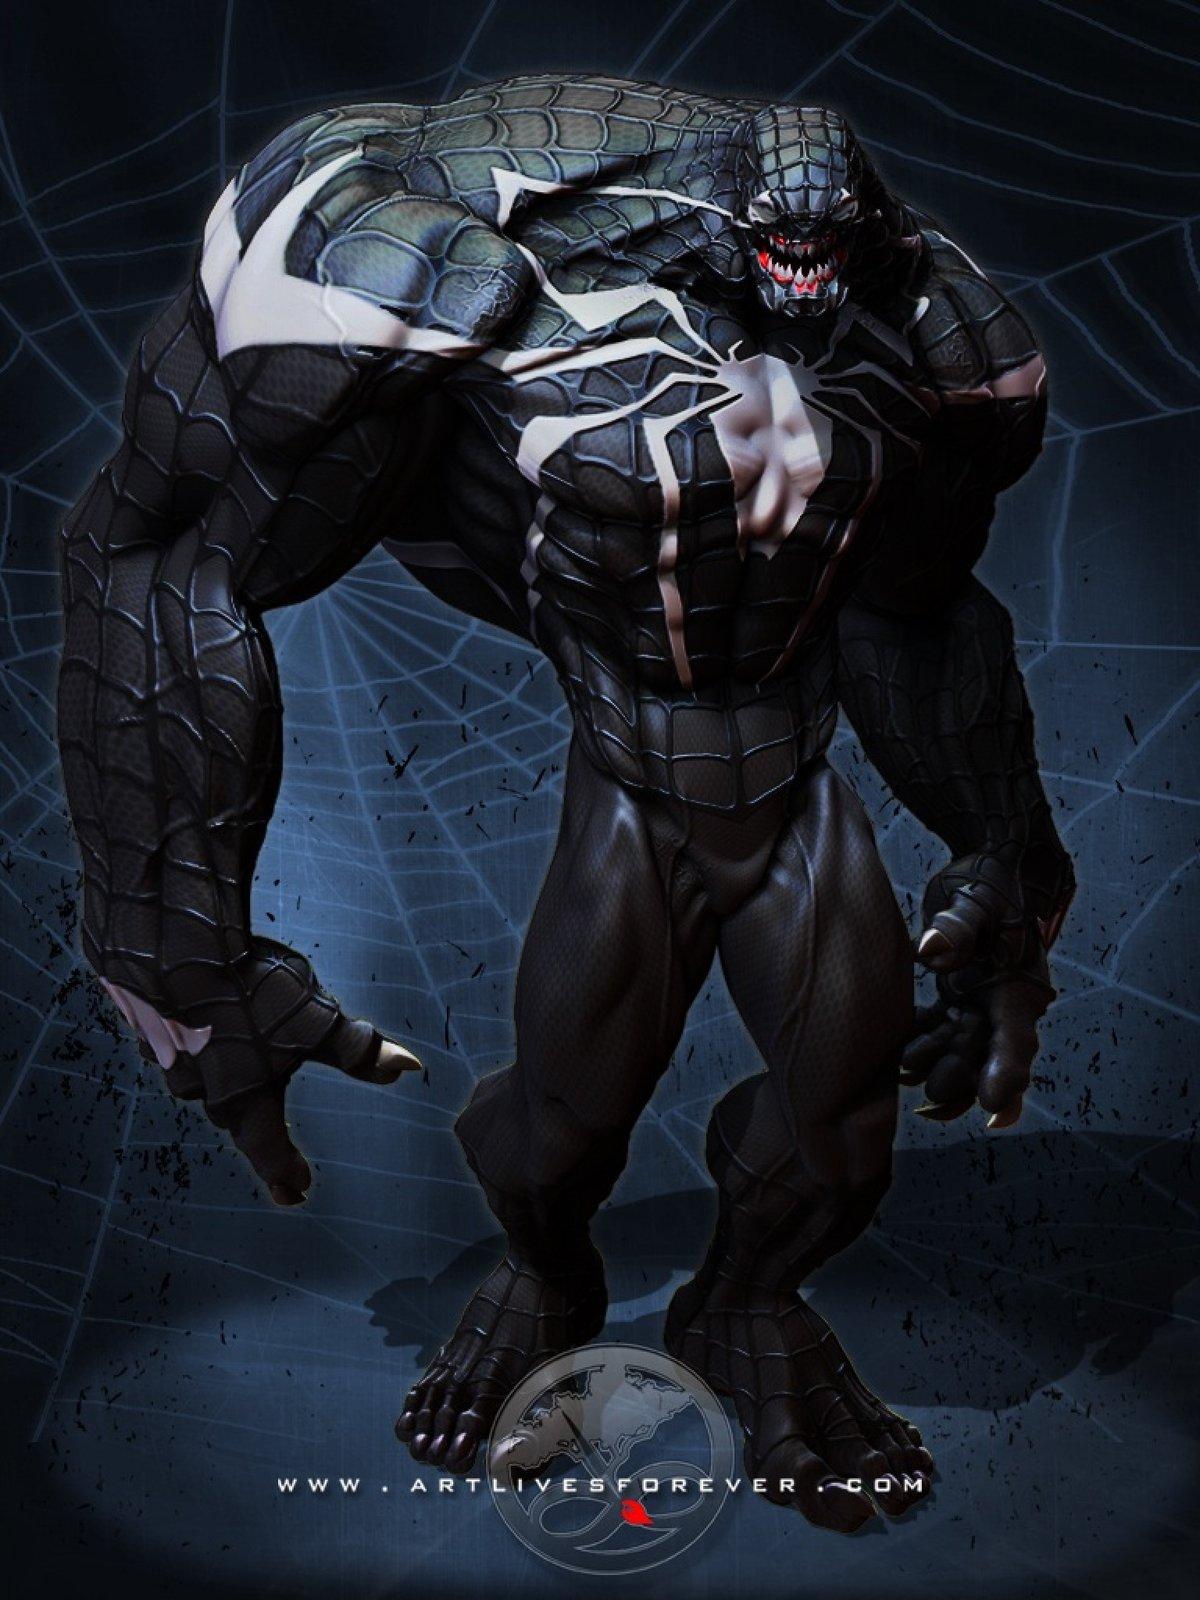 Here's Venom!